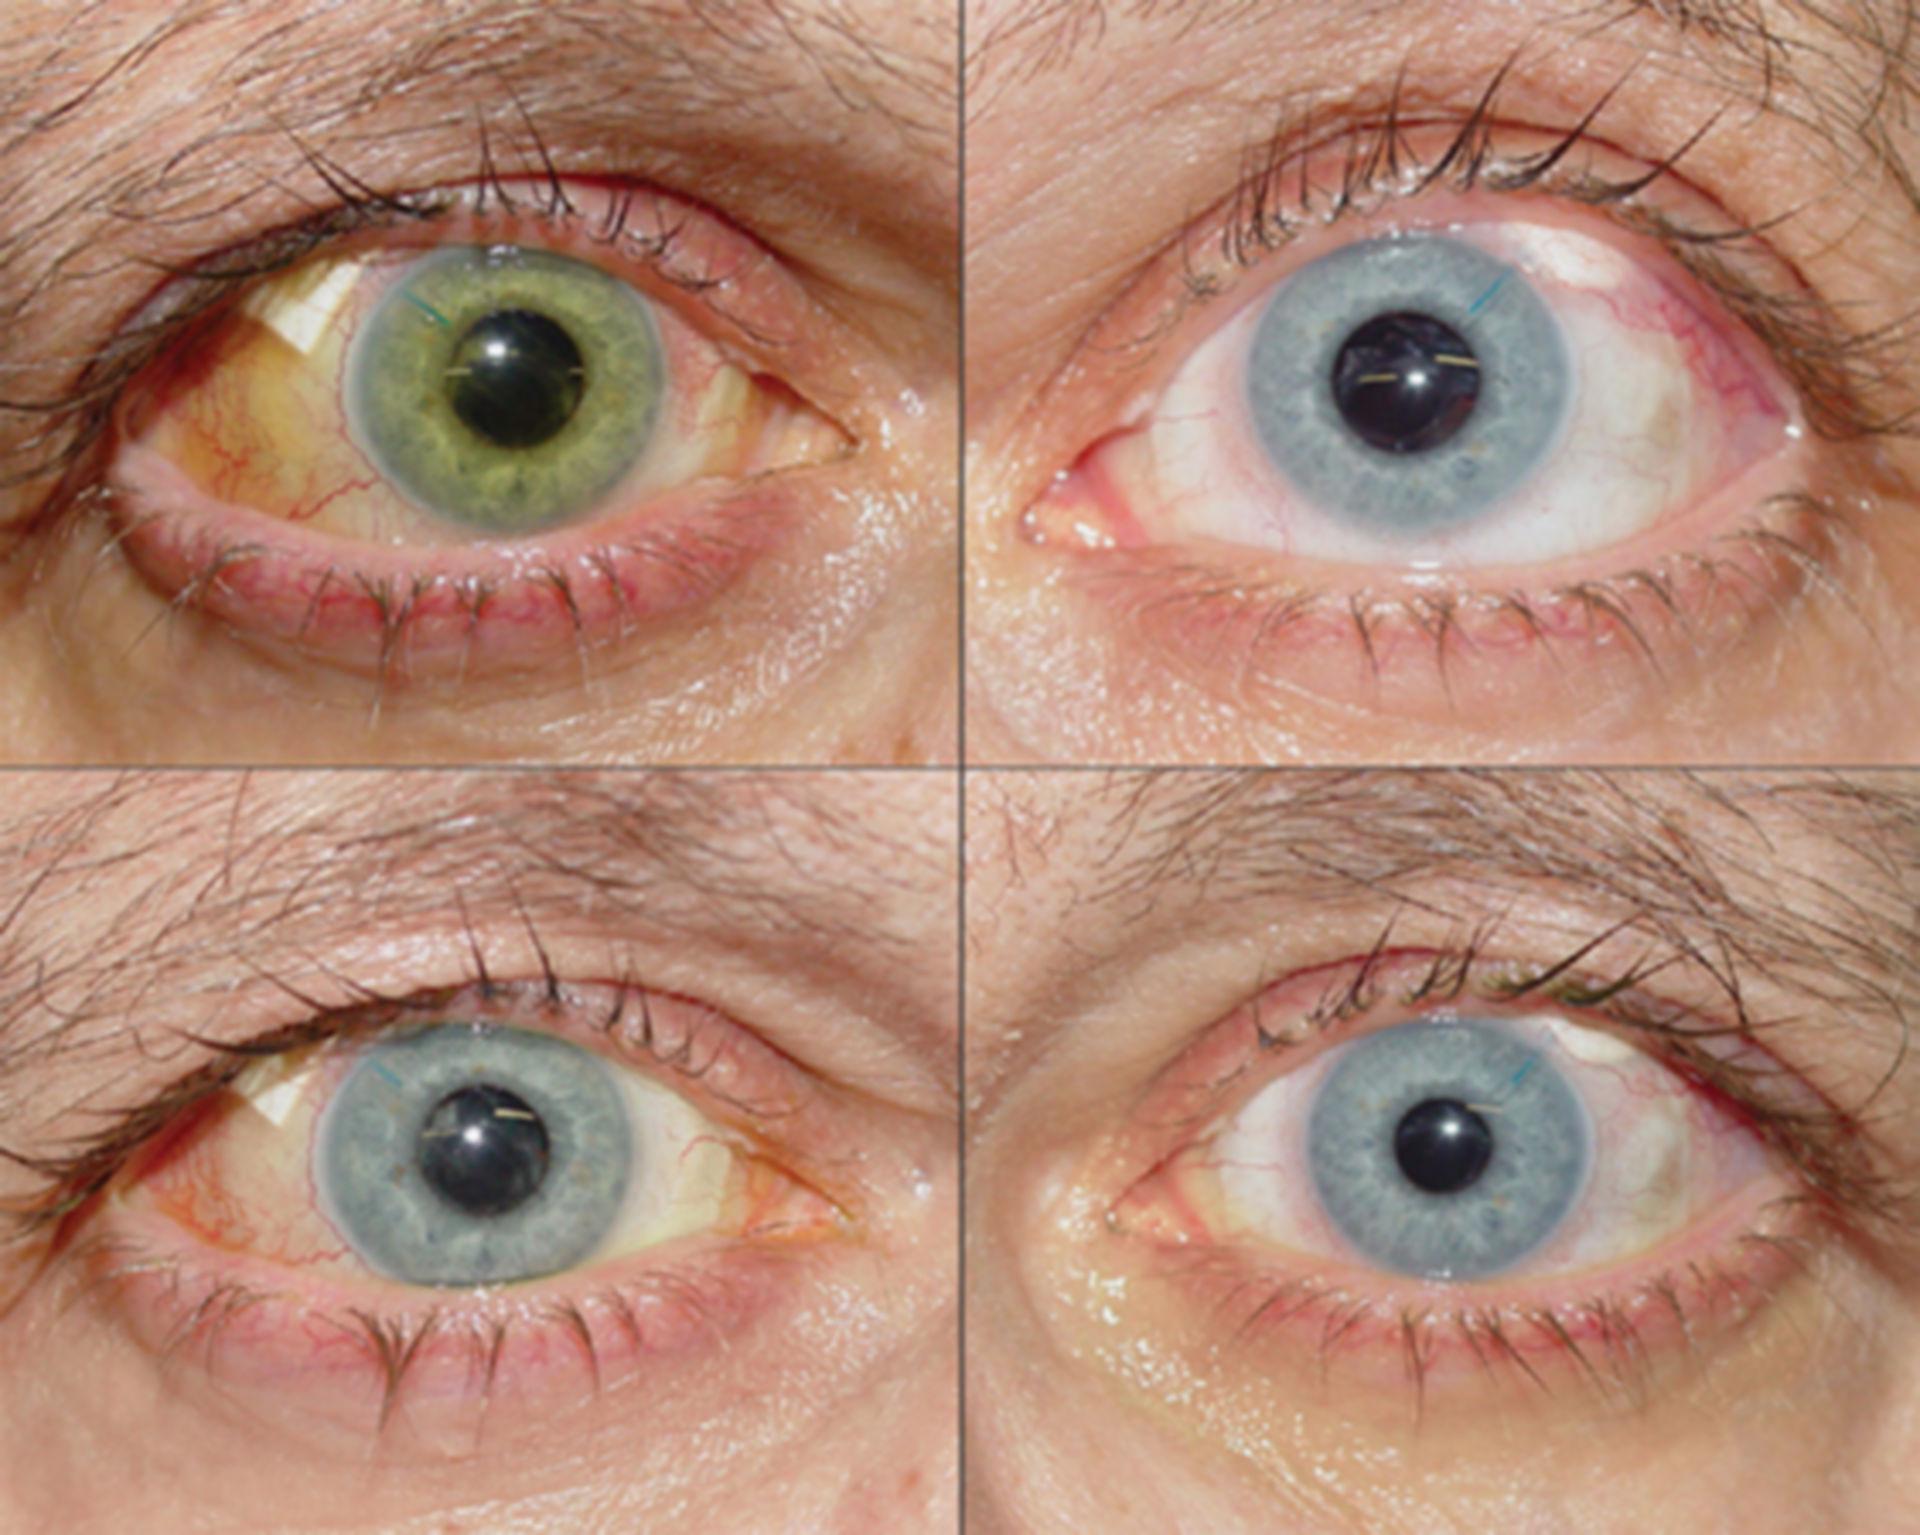 Verfärbung der Iris nach Glaukom-Operation